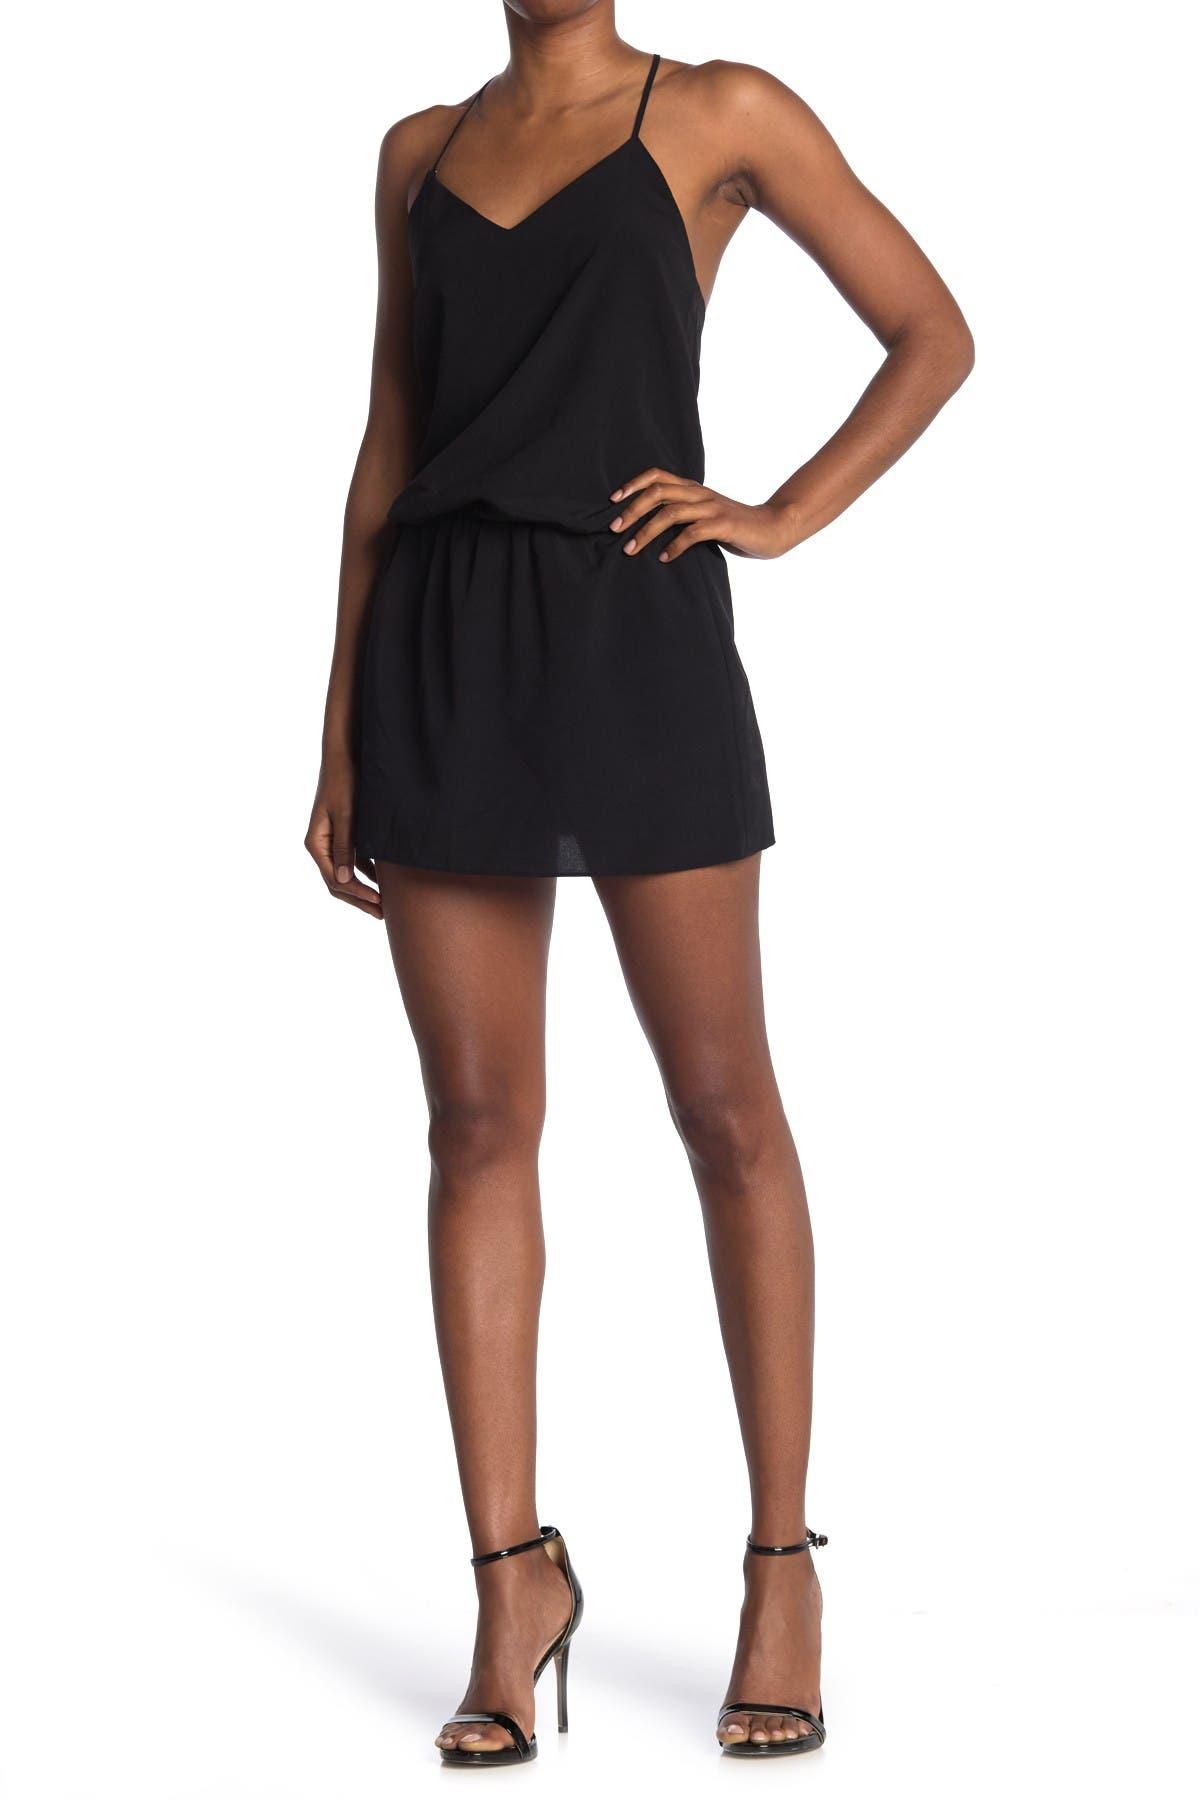 Image of HALSTON Mirage Mini Dress